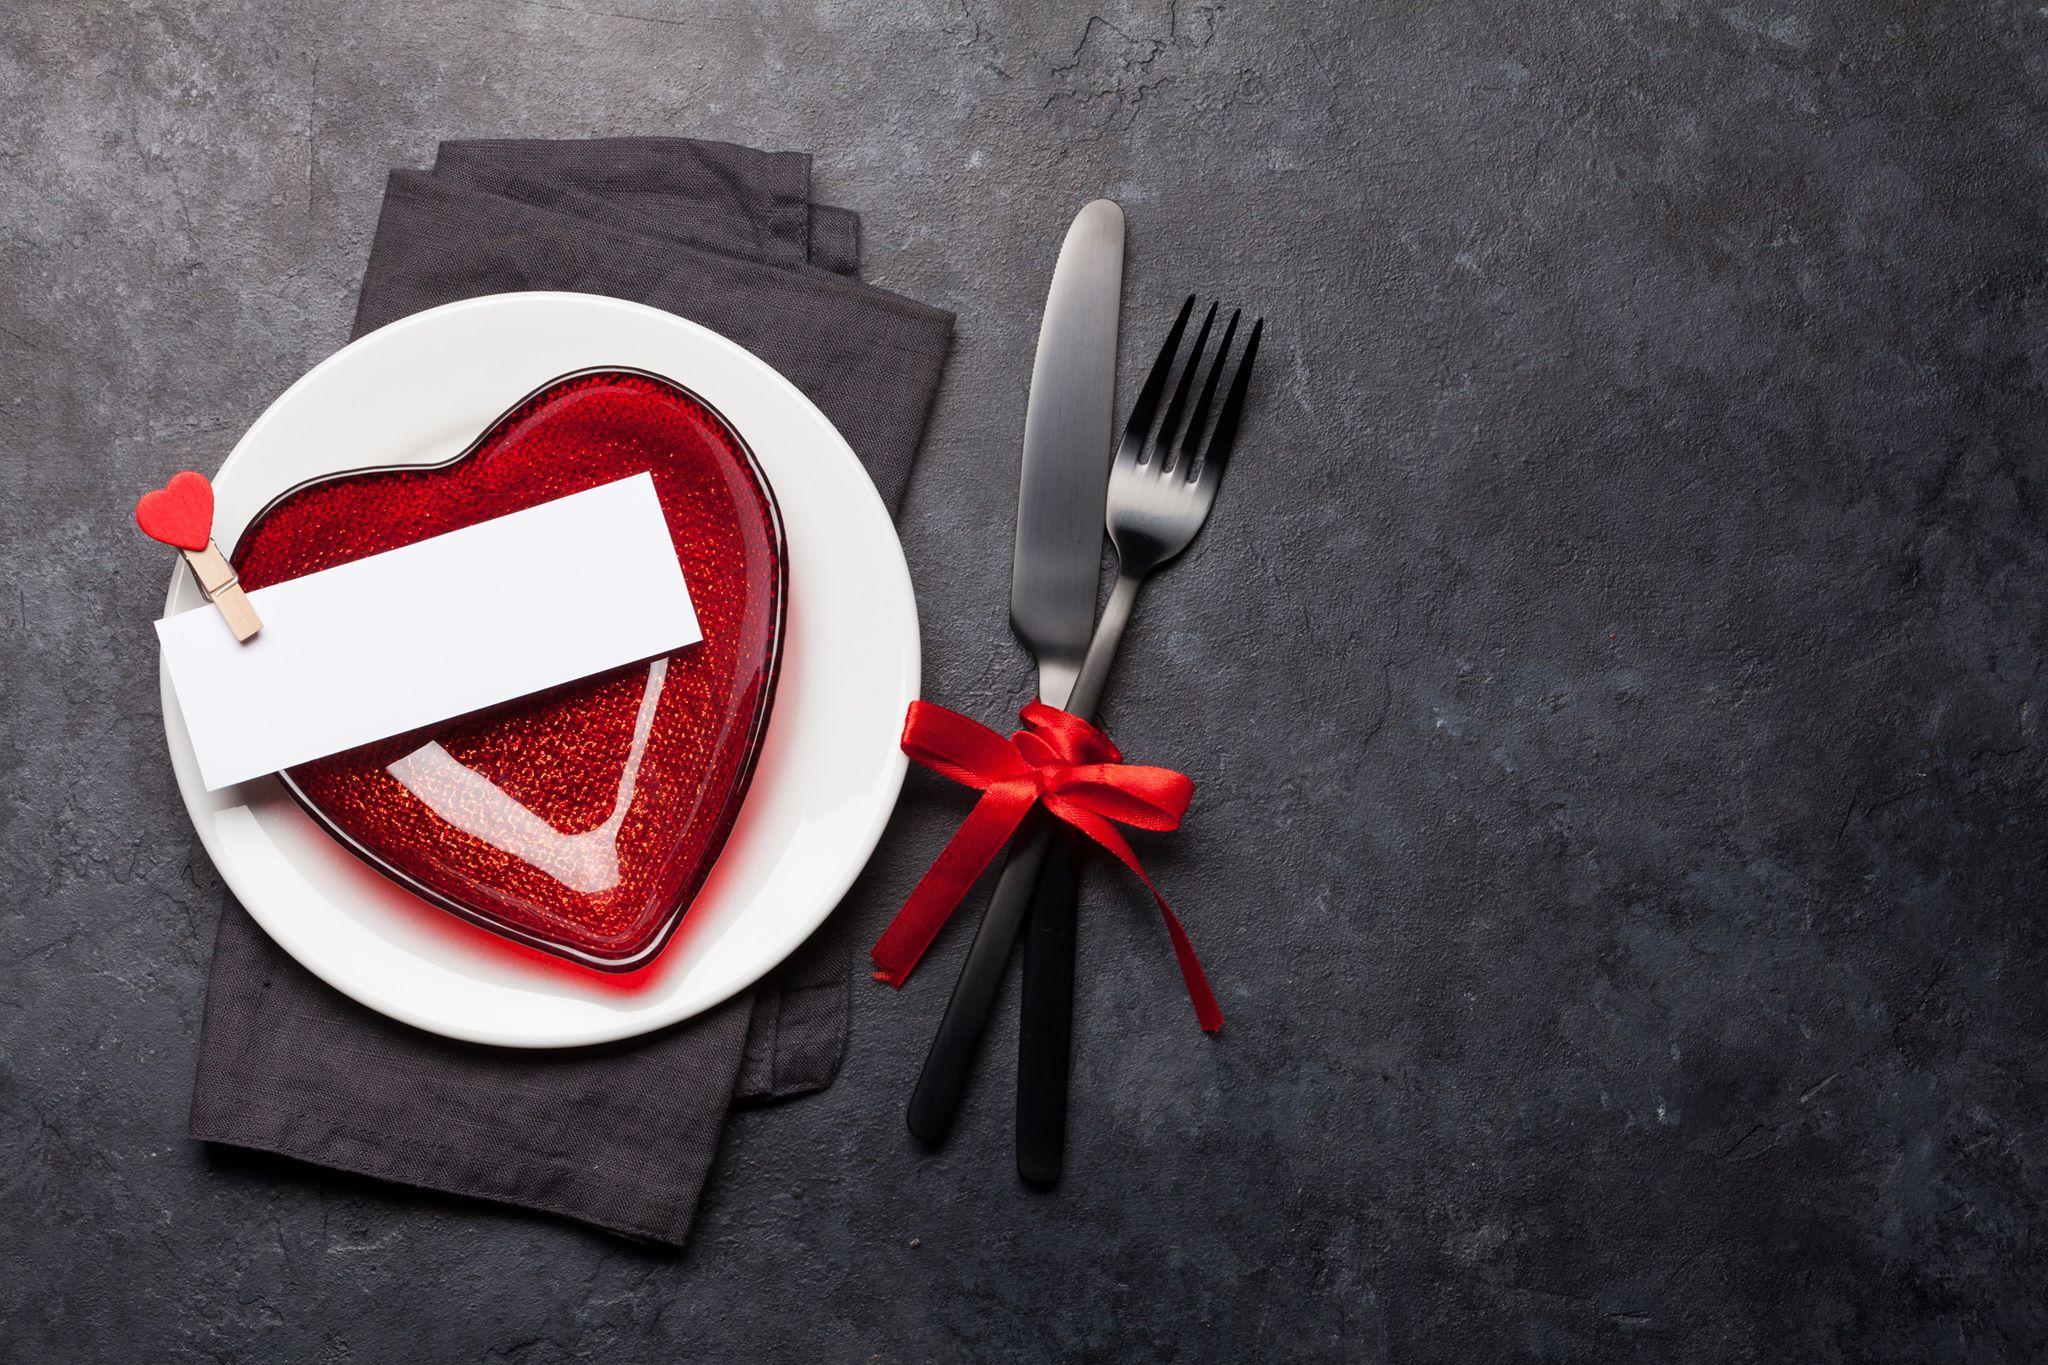 Valentines day images 3 صور عيد الحب